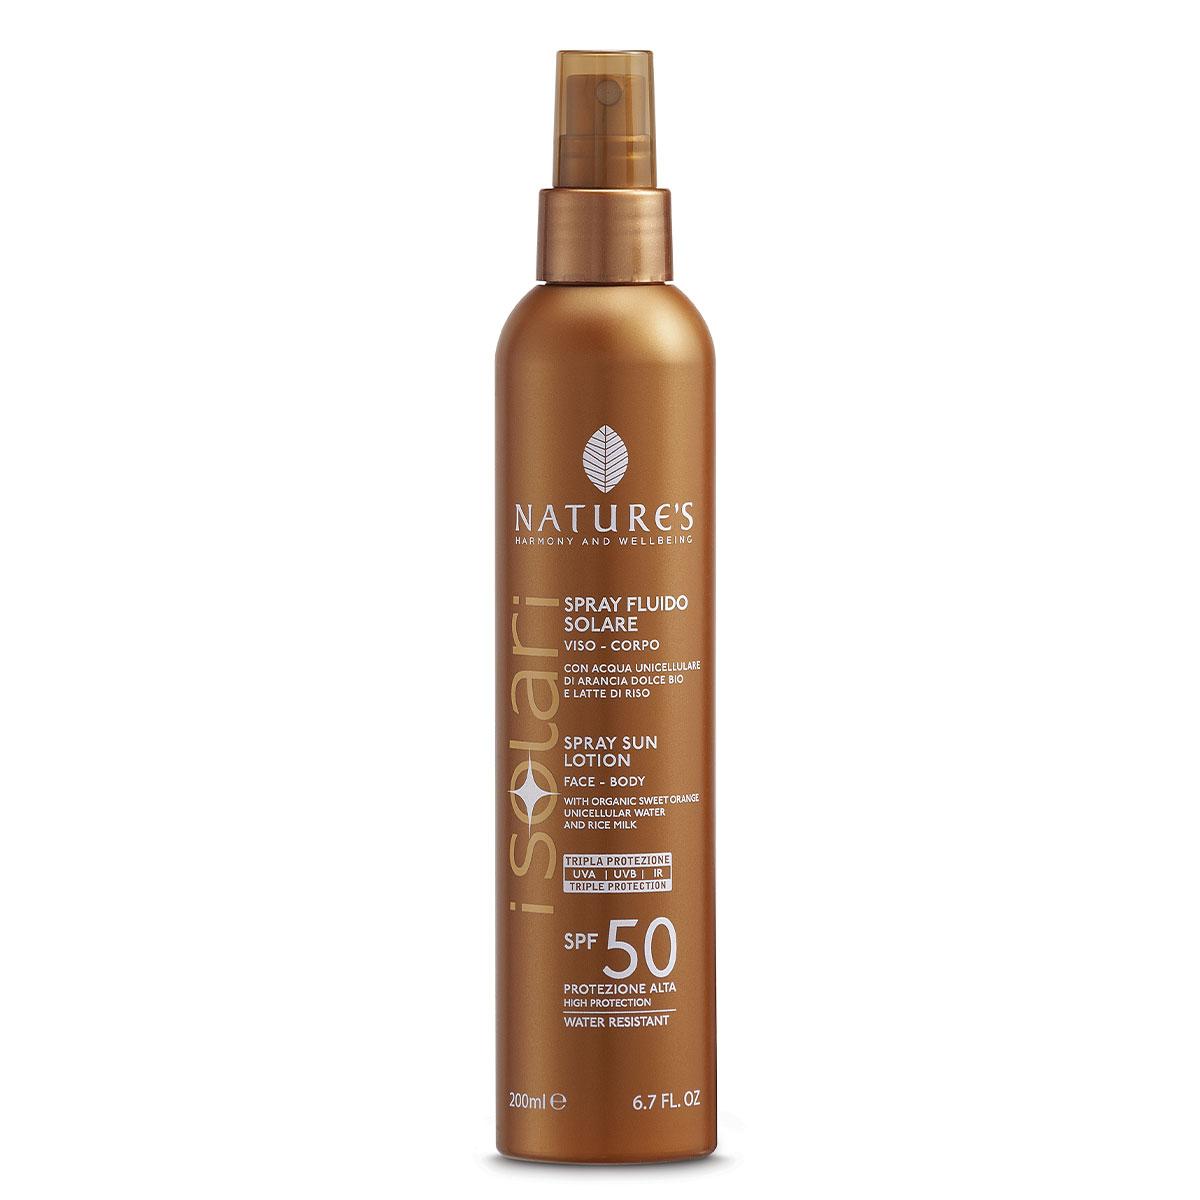 Spray Fluido Solare SPF50